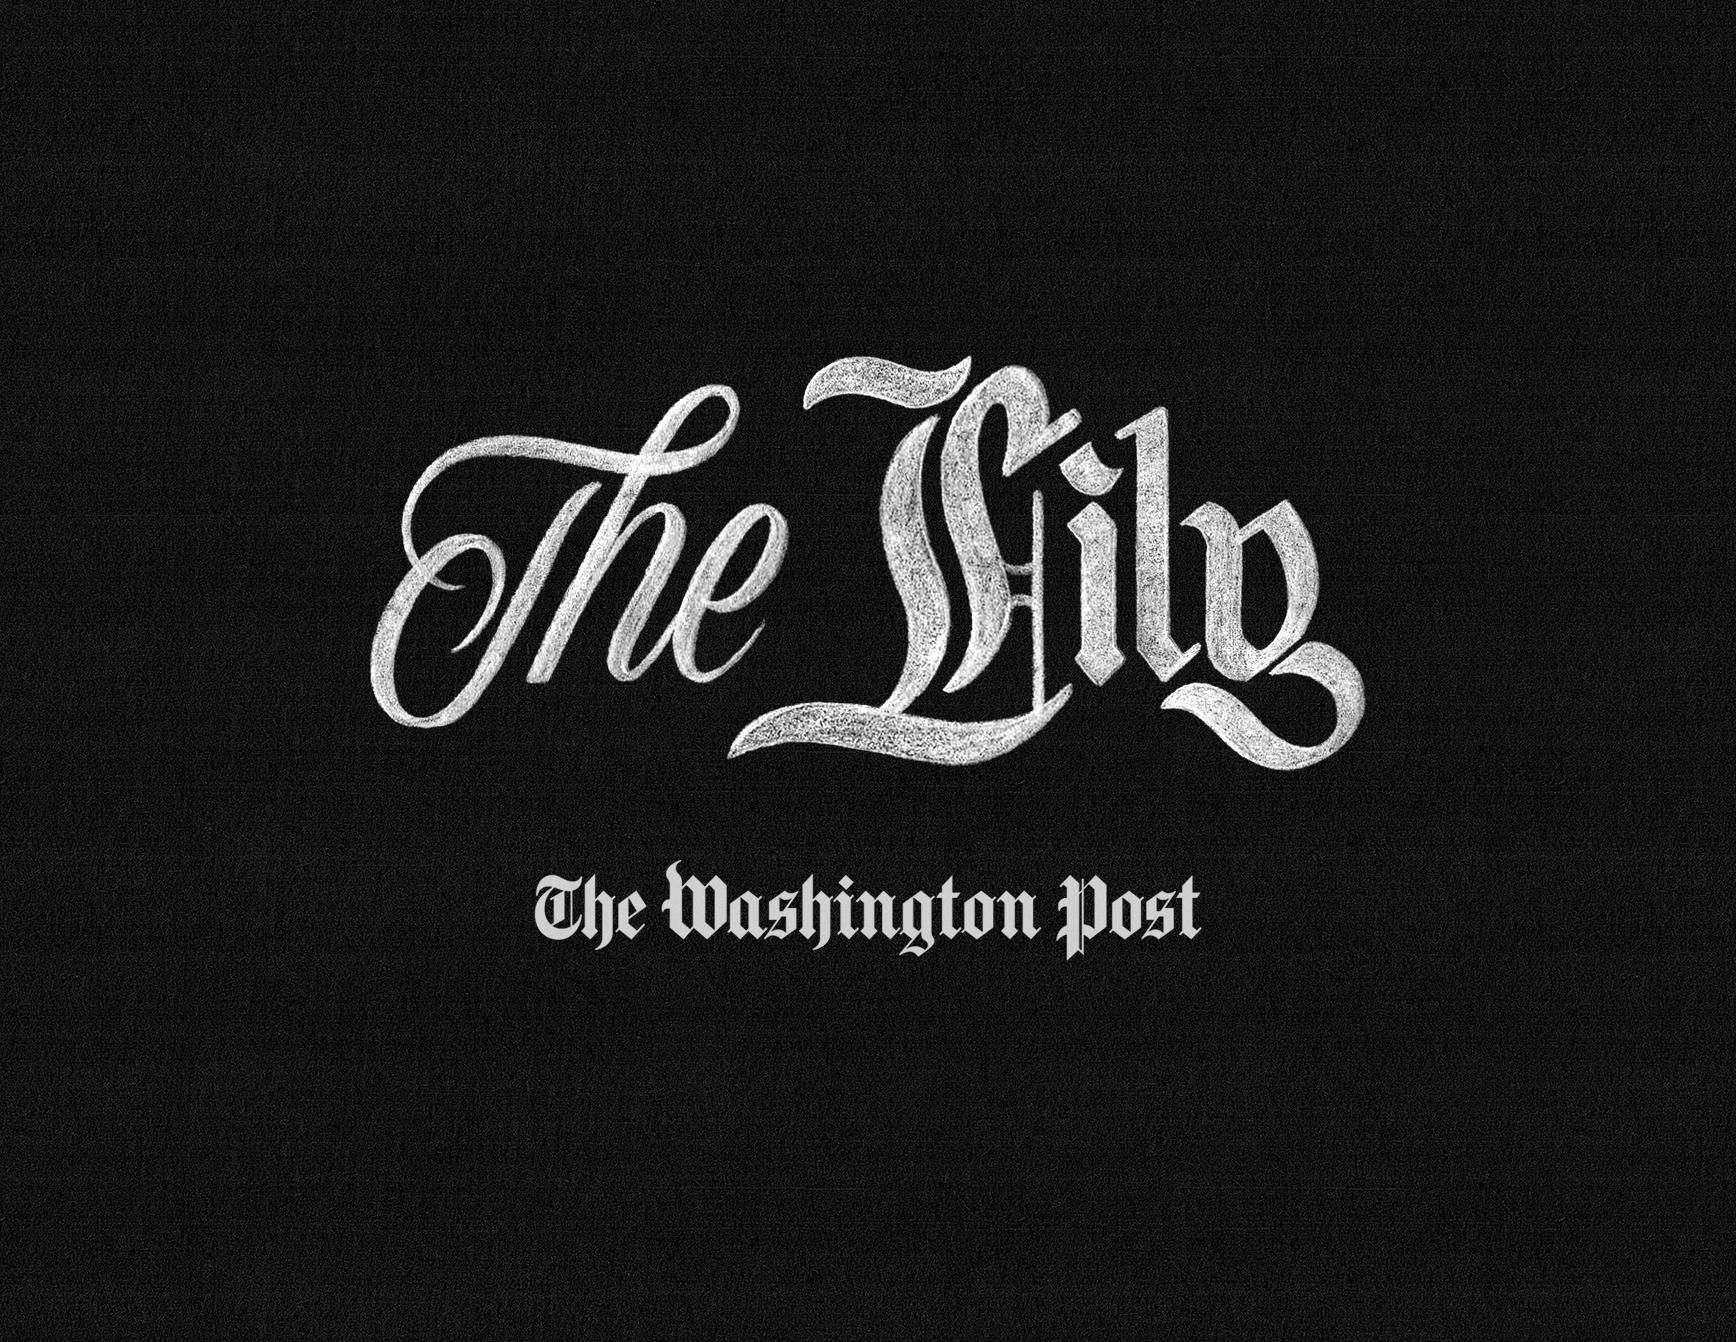 THE WASHINGTON POST - THE LILY  LOGO DESIGN